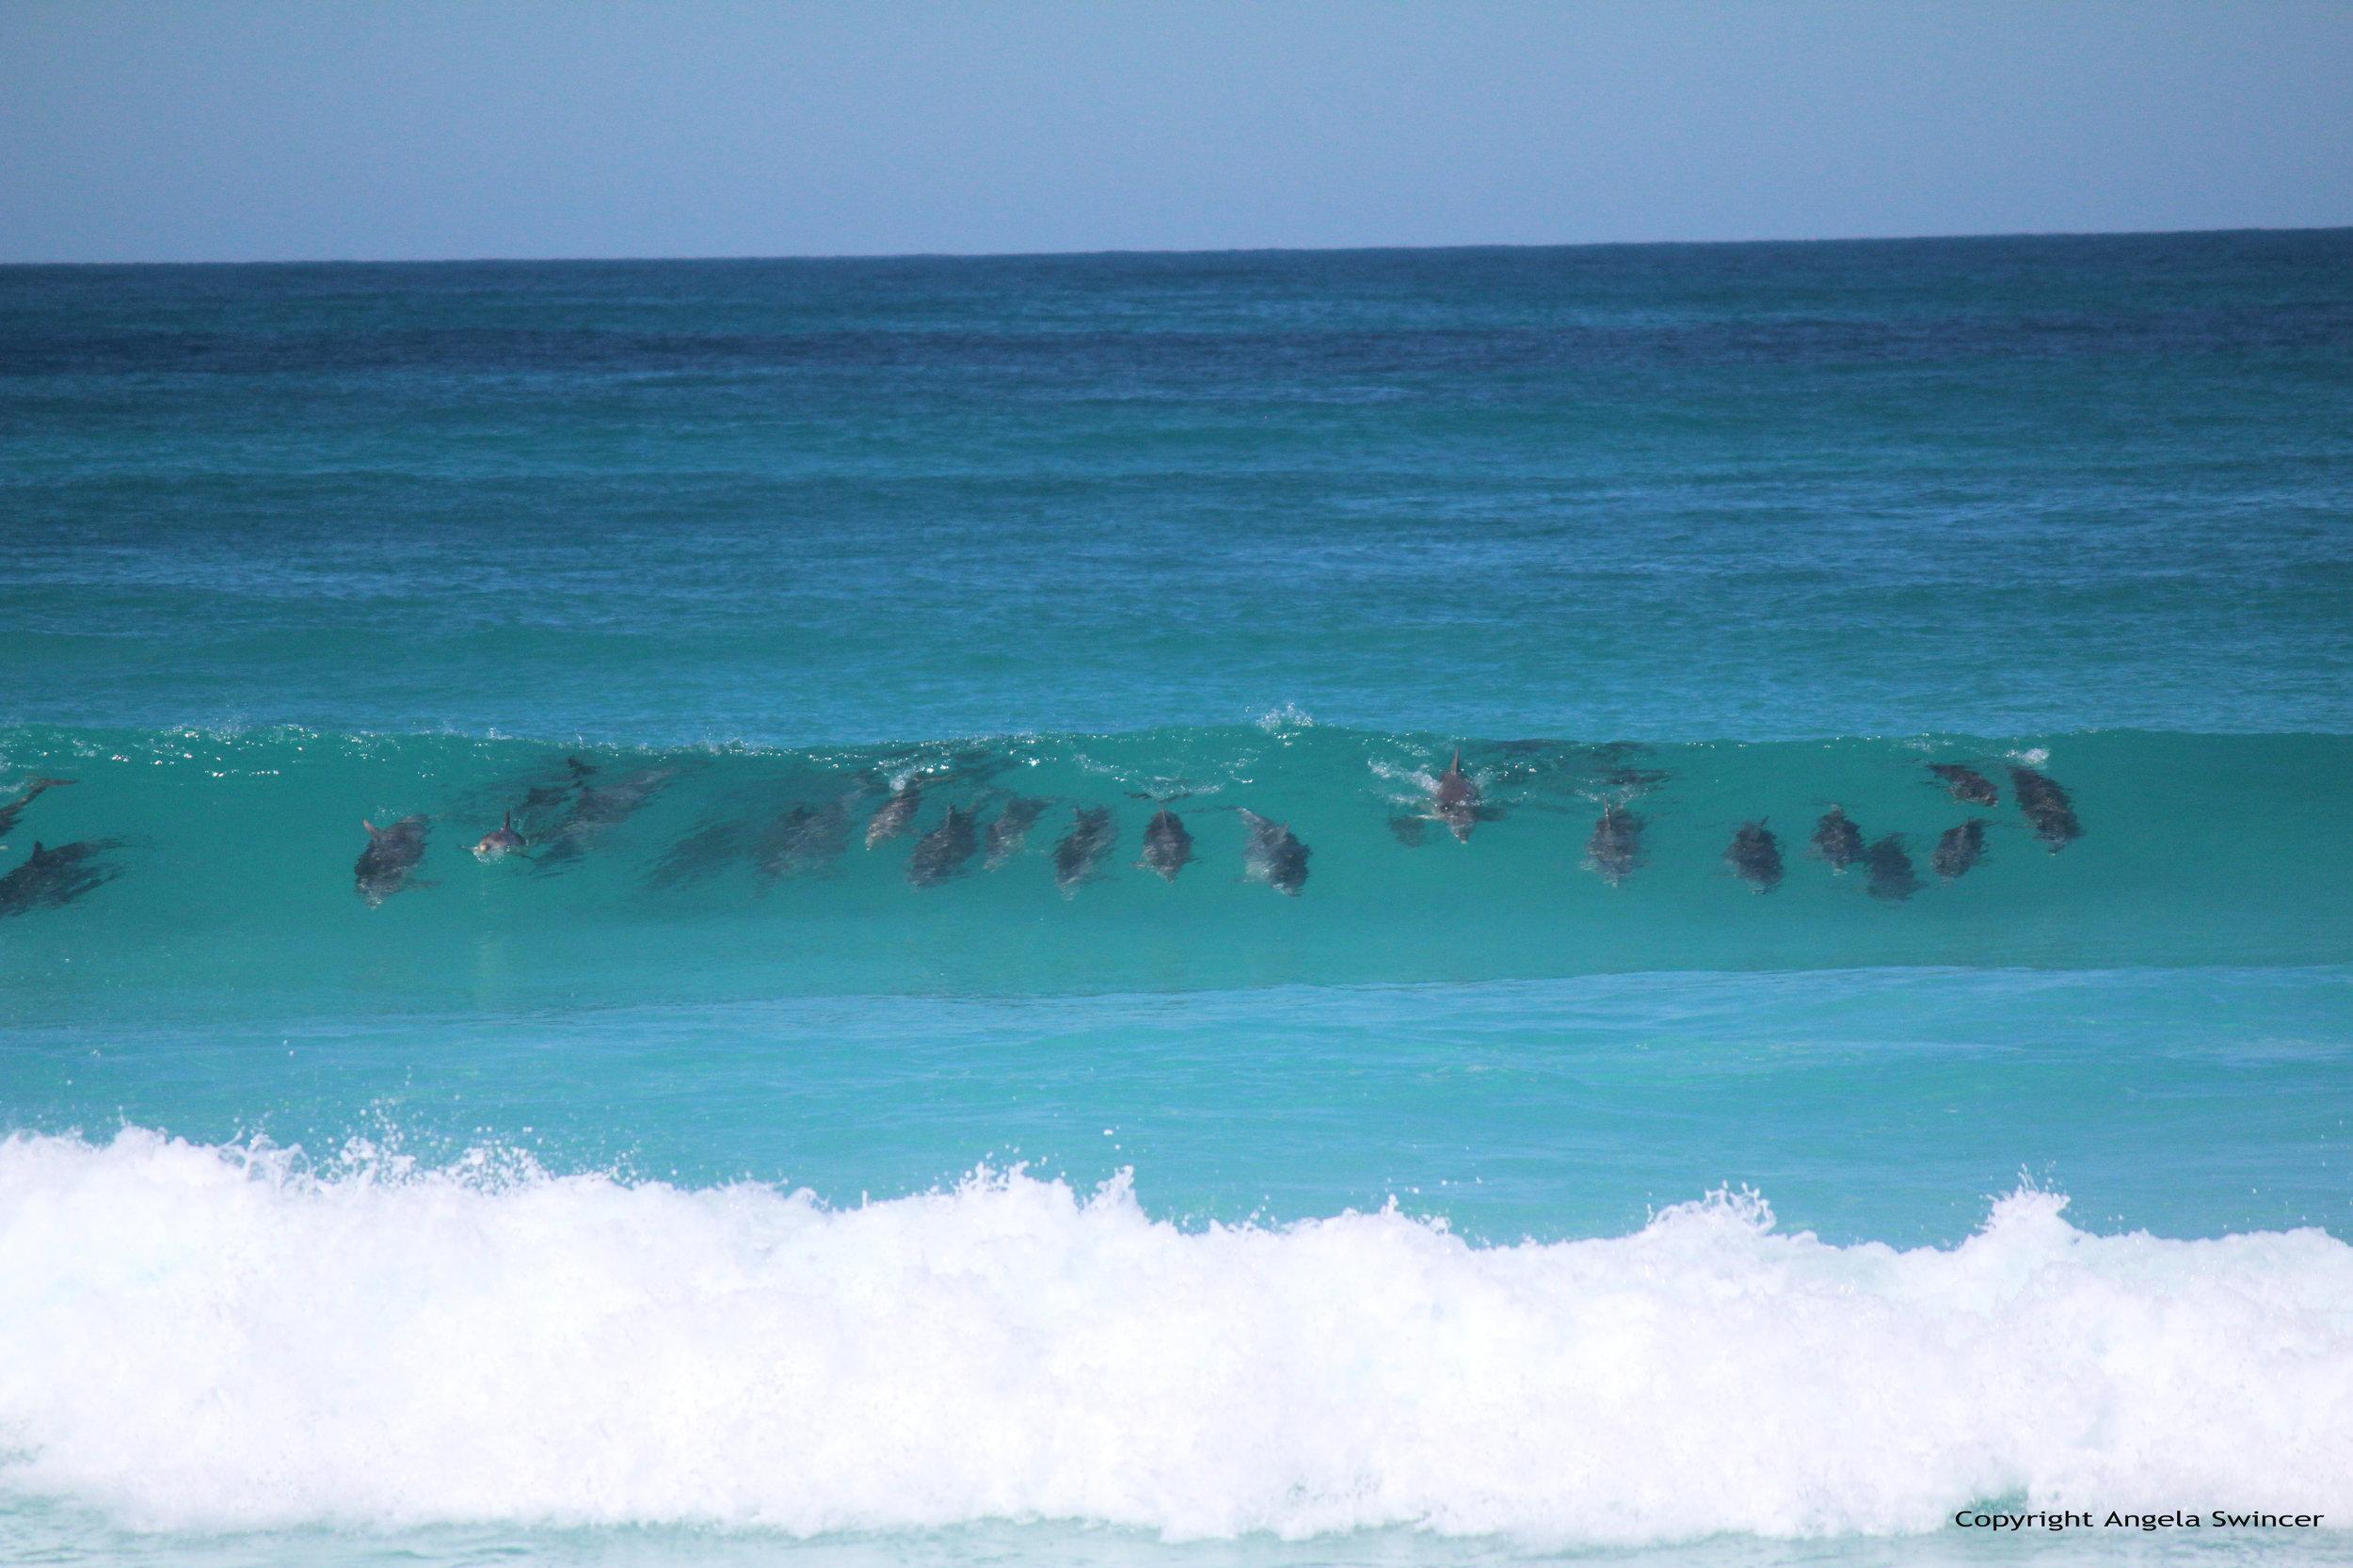 RS3649_Surfing Dolphins_AngelaSwincer_Fowlersbay.jpg